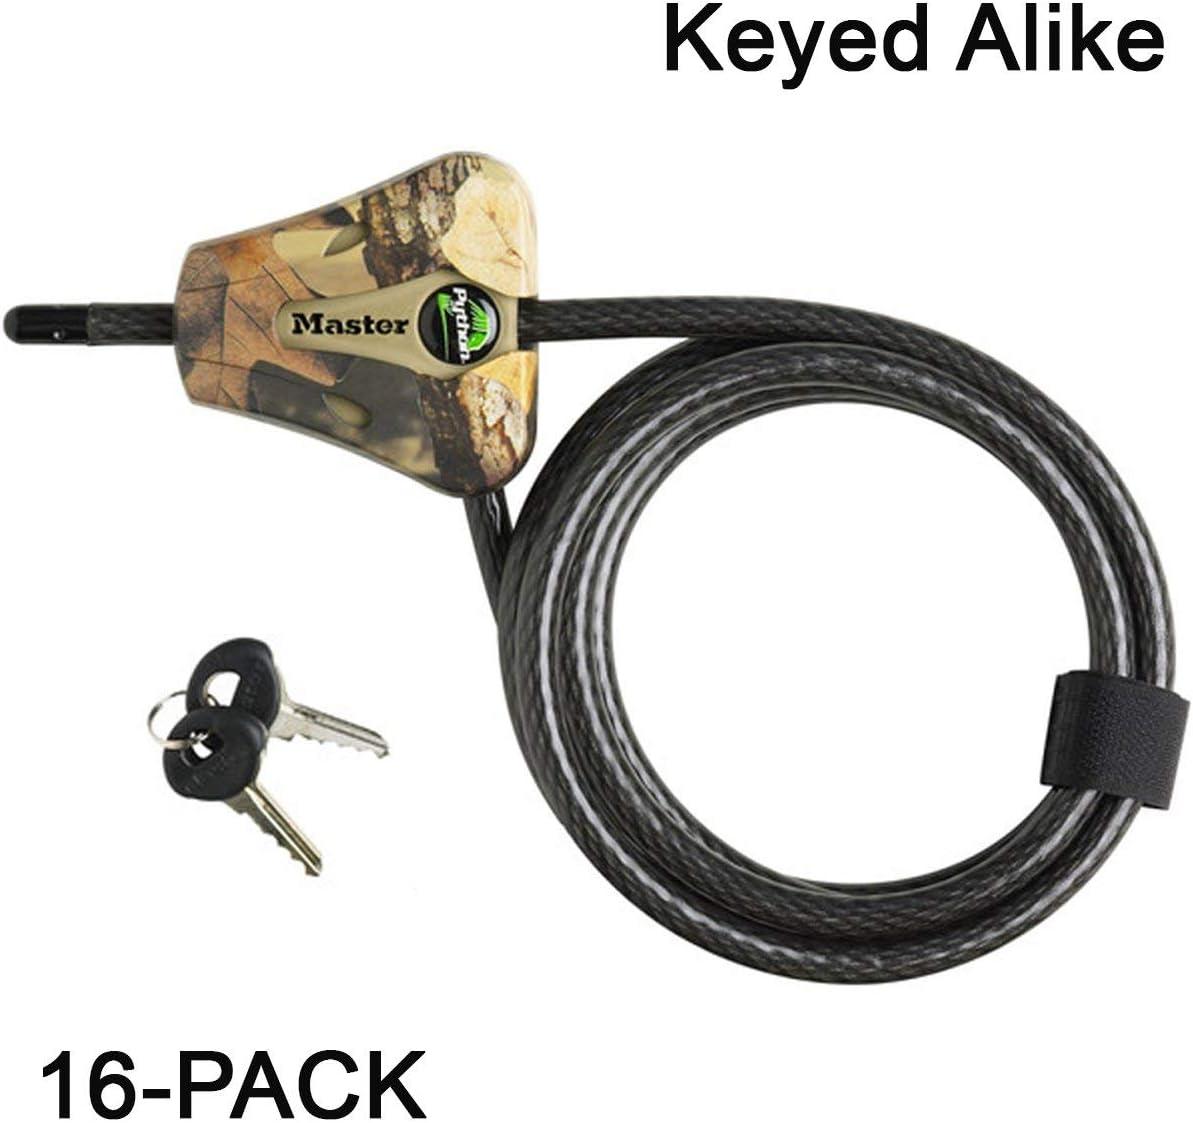 2 keys Rust Resistant 6.5 feet Kayak Security Cable Keyed Locking